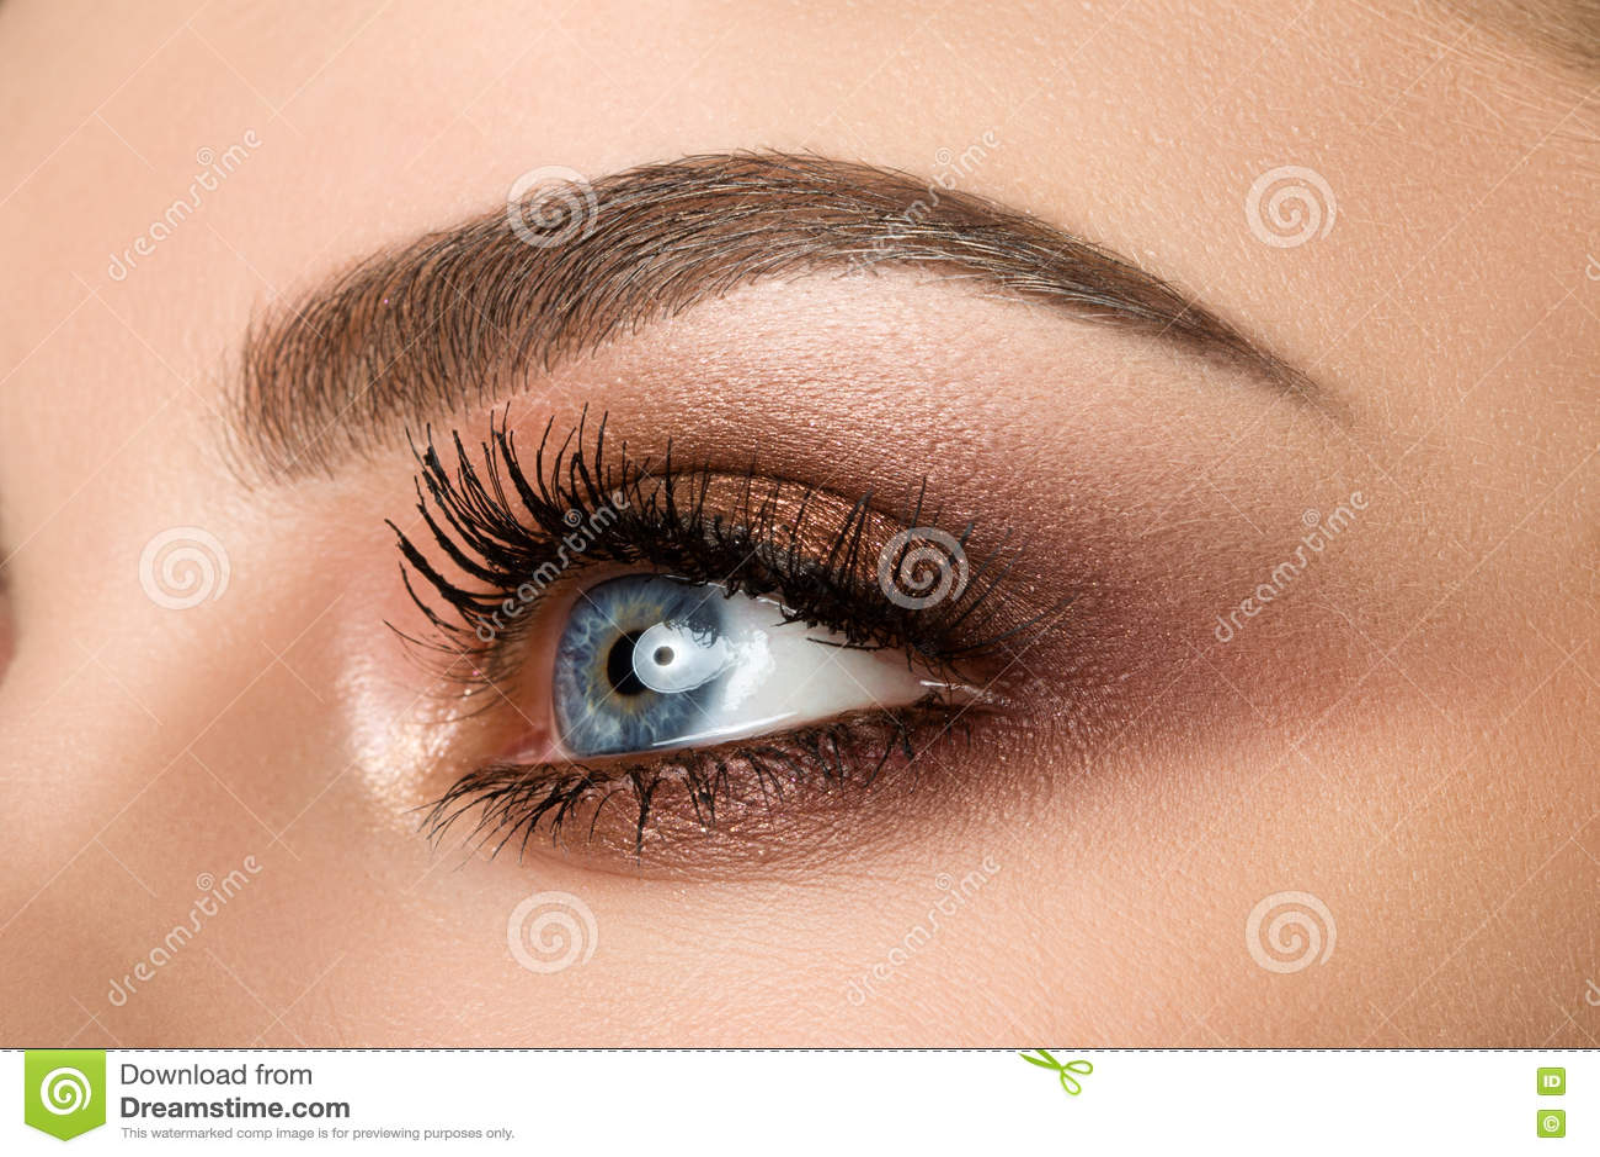 Close Up Of Woman Eye With Beautiful Brown Smokey Eyes Makeup Stock